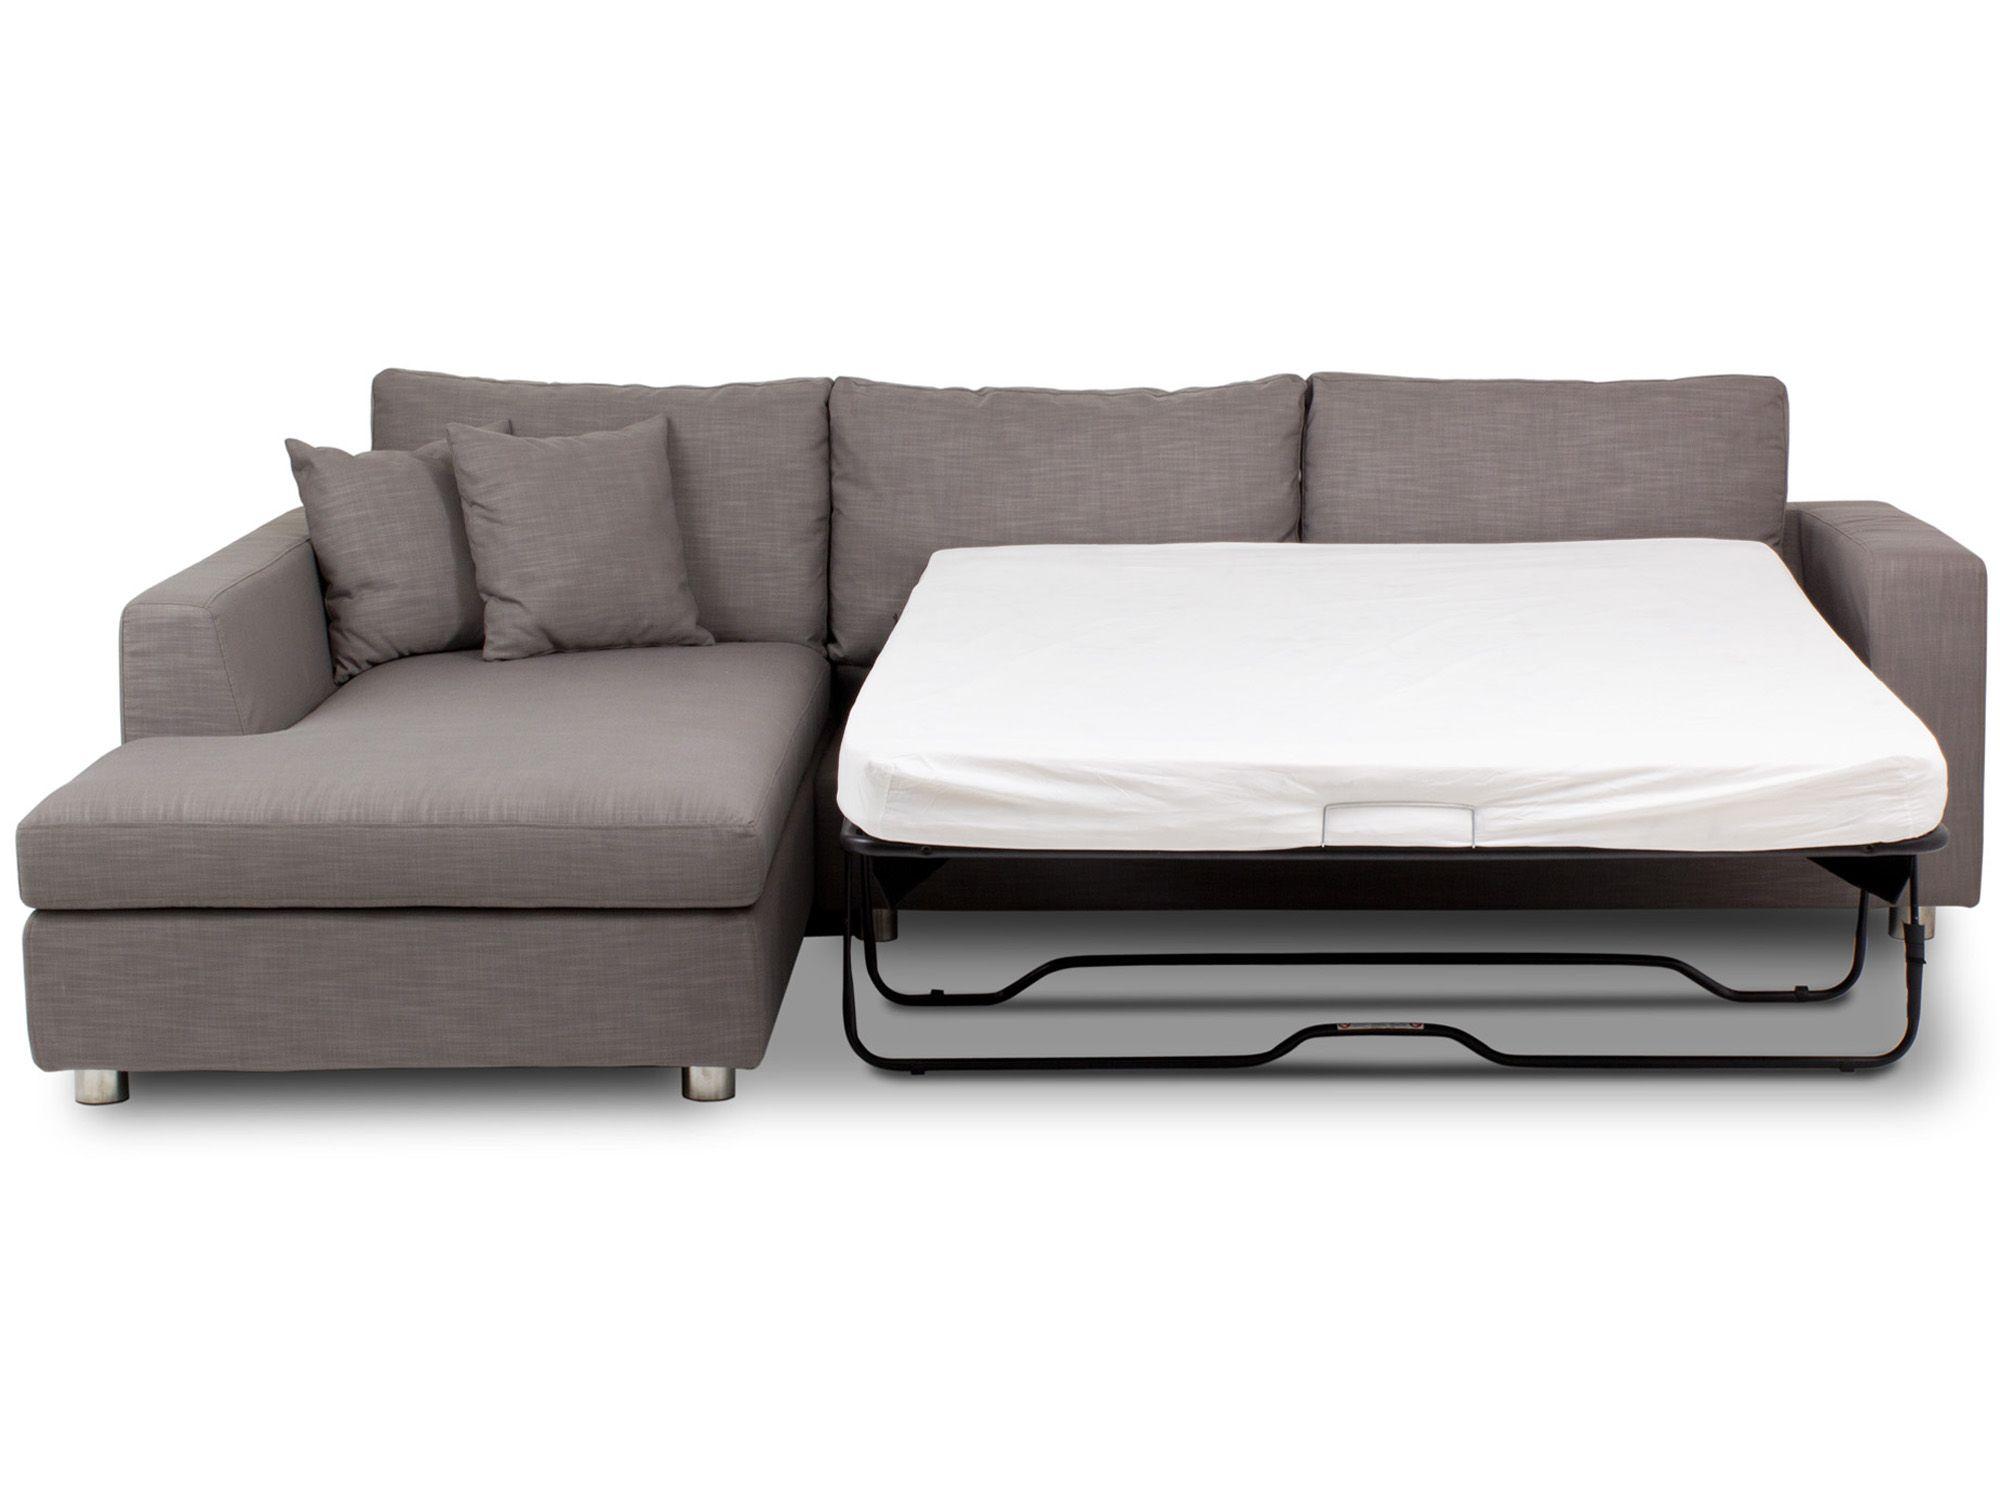 Mondo Storage Corner Sofa Bed Sofa bed with storage